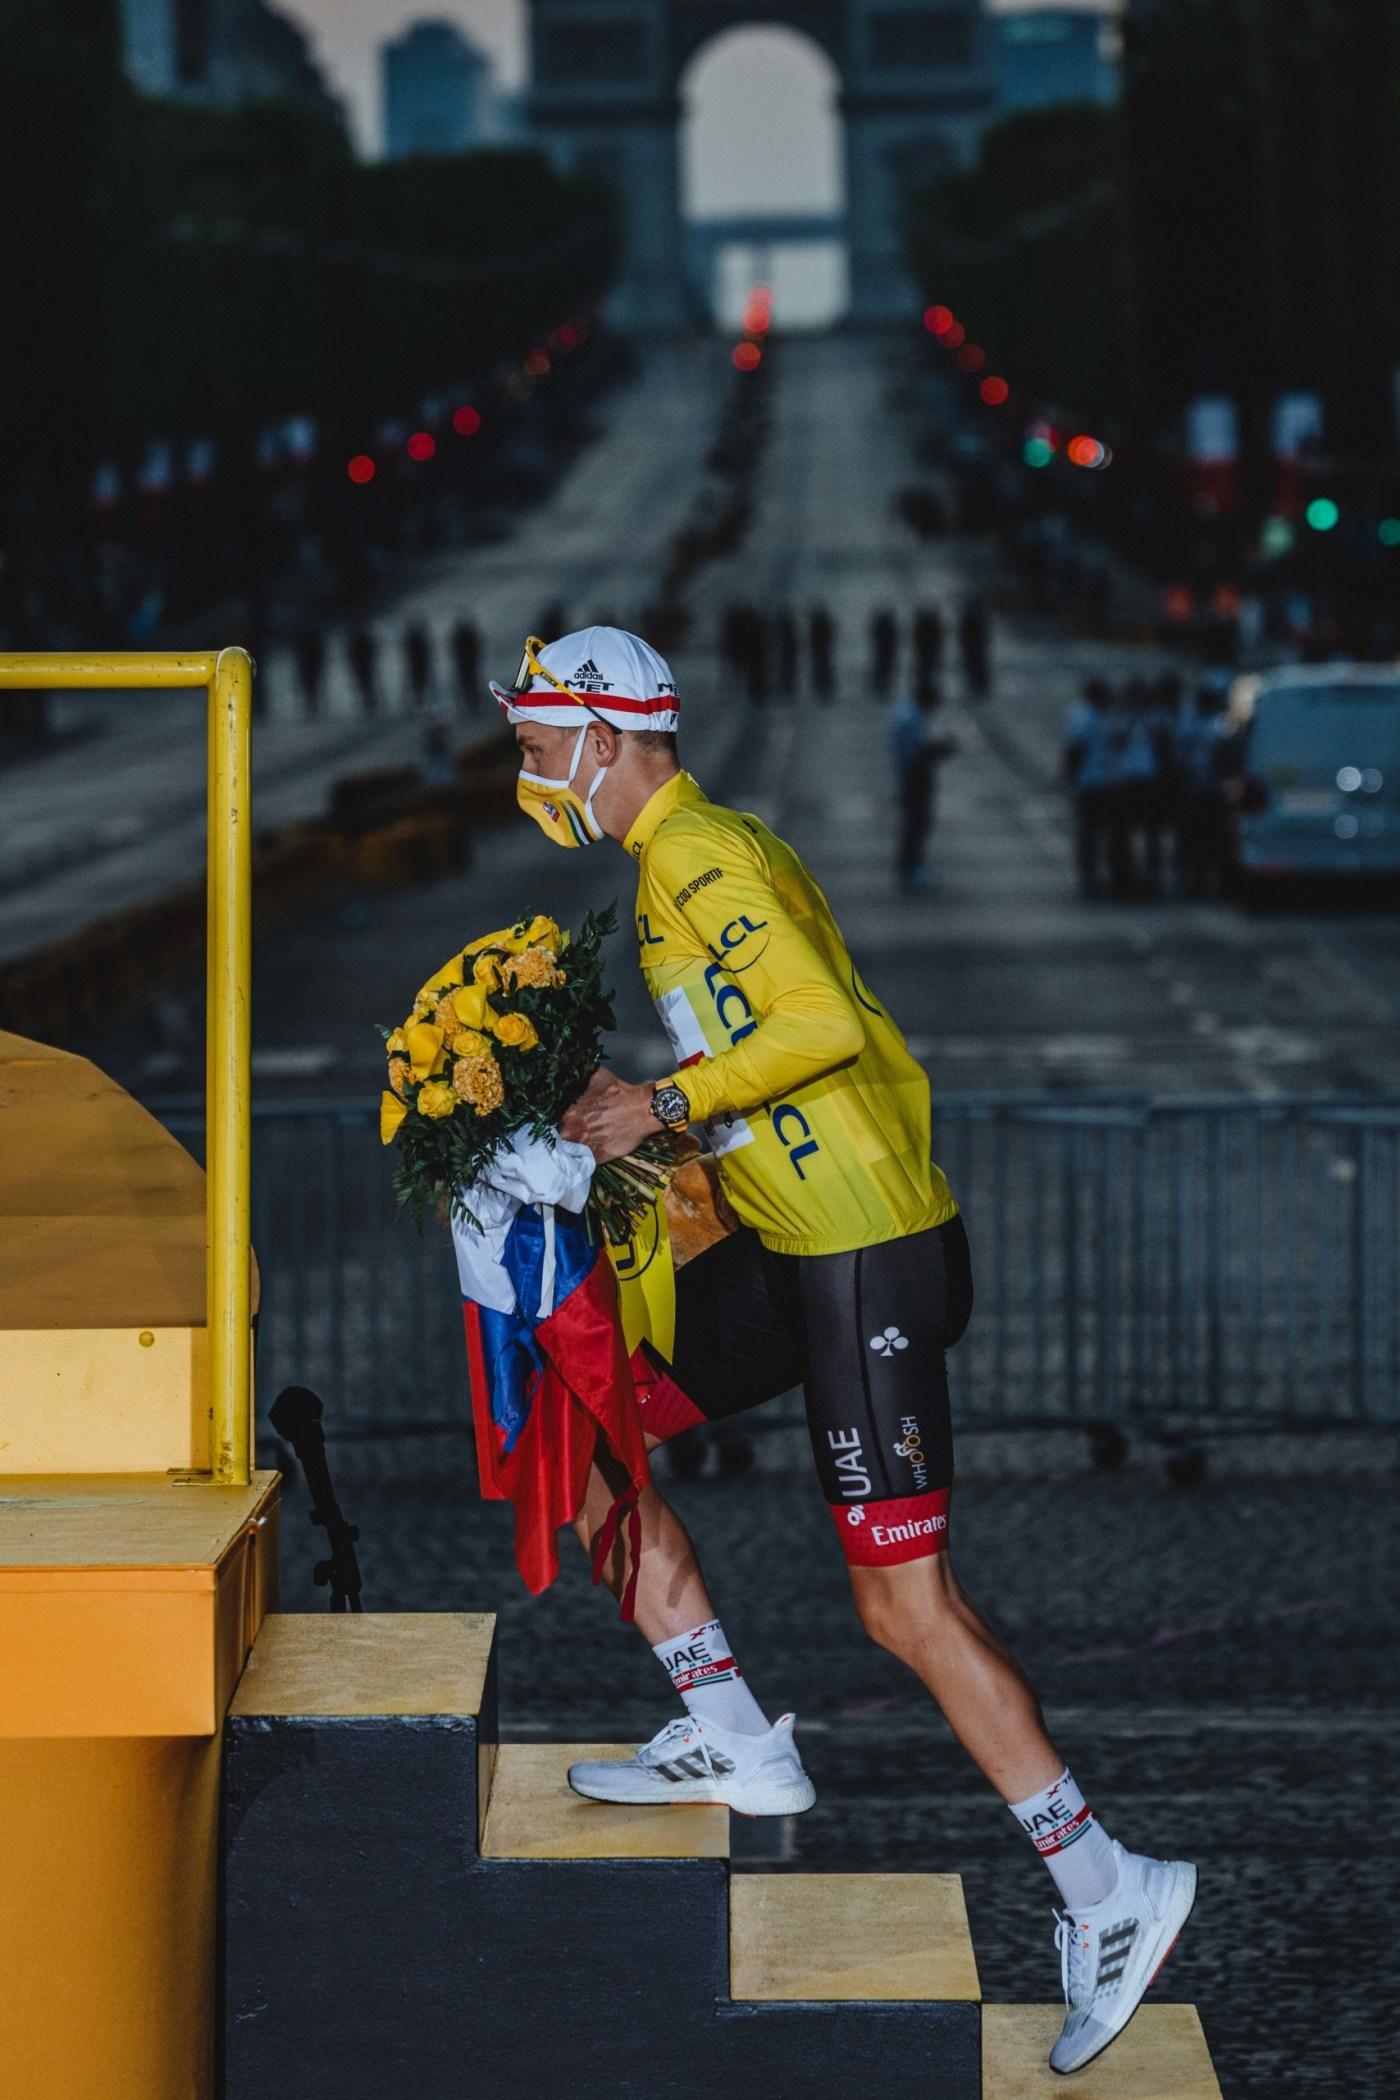 Breitling Ambassador Tadej Pogacar Wins Tour de France Wearing Endurance Pro